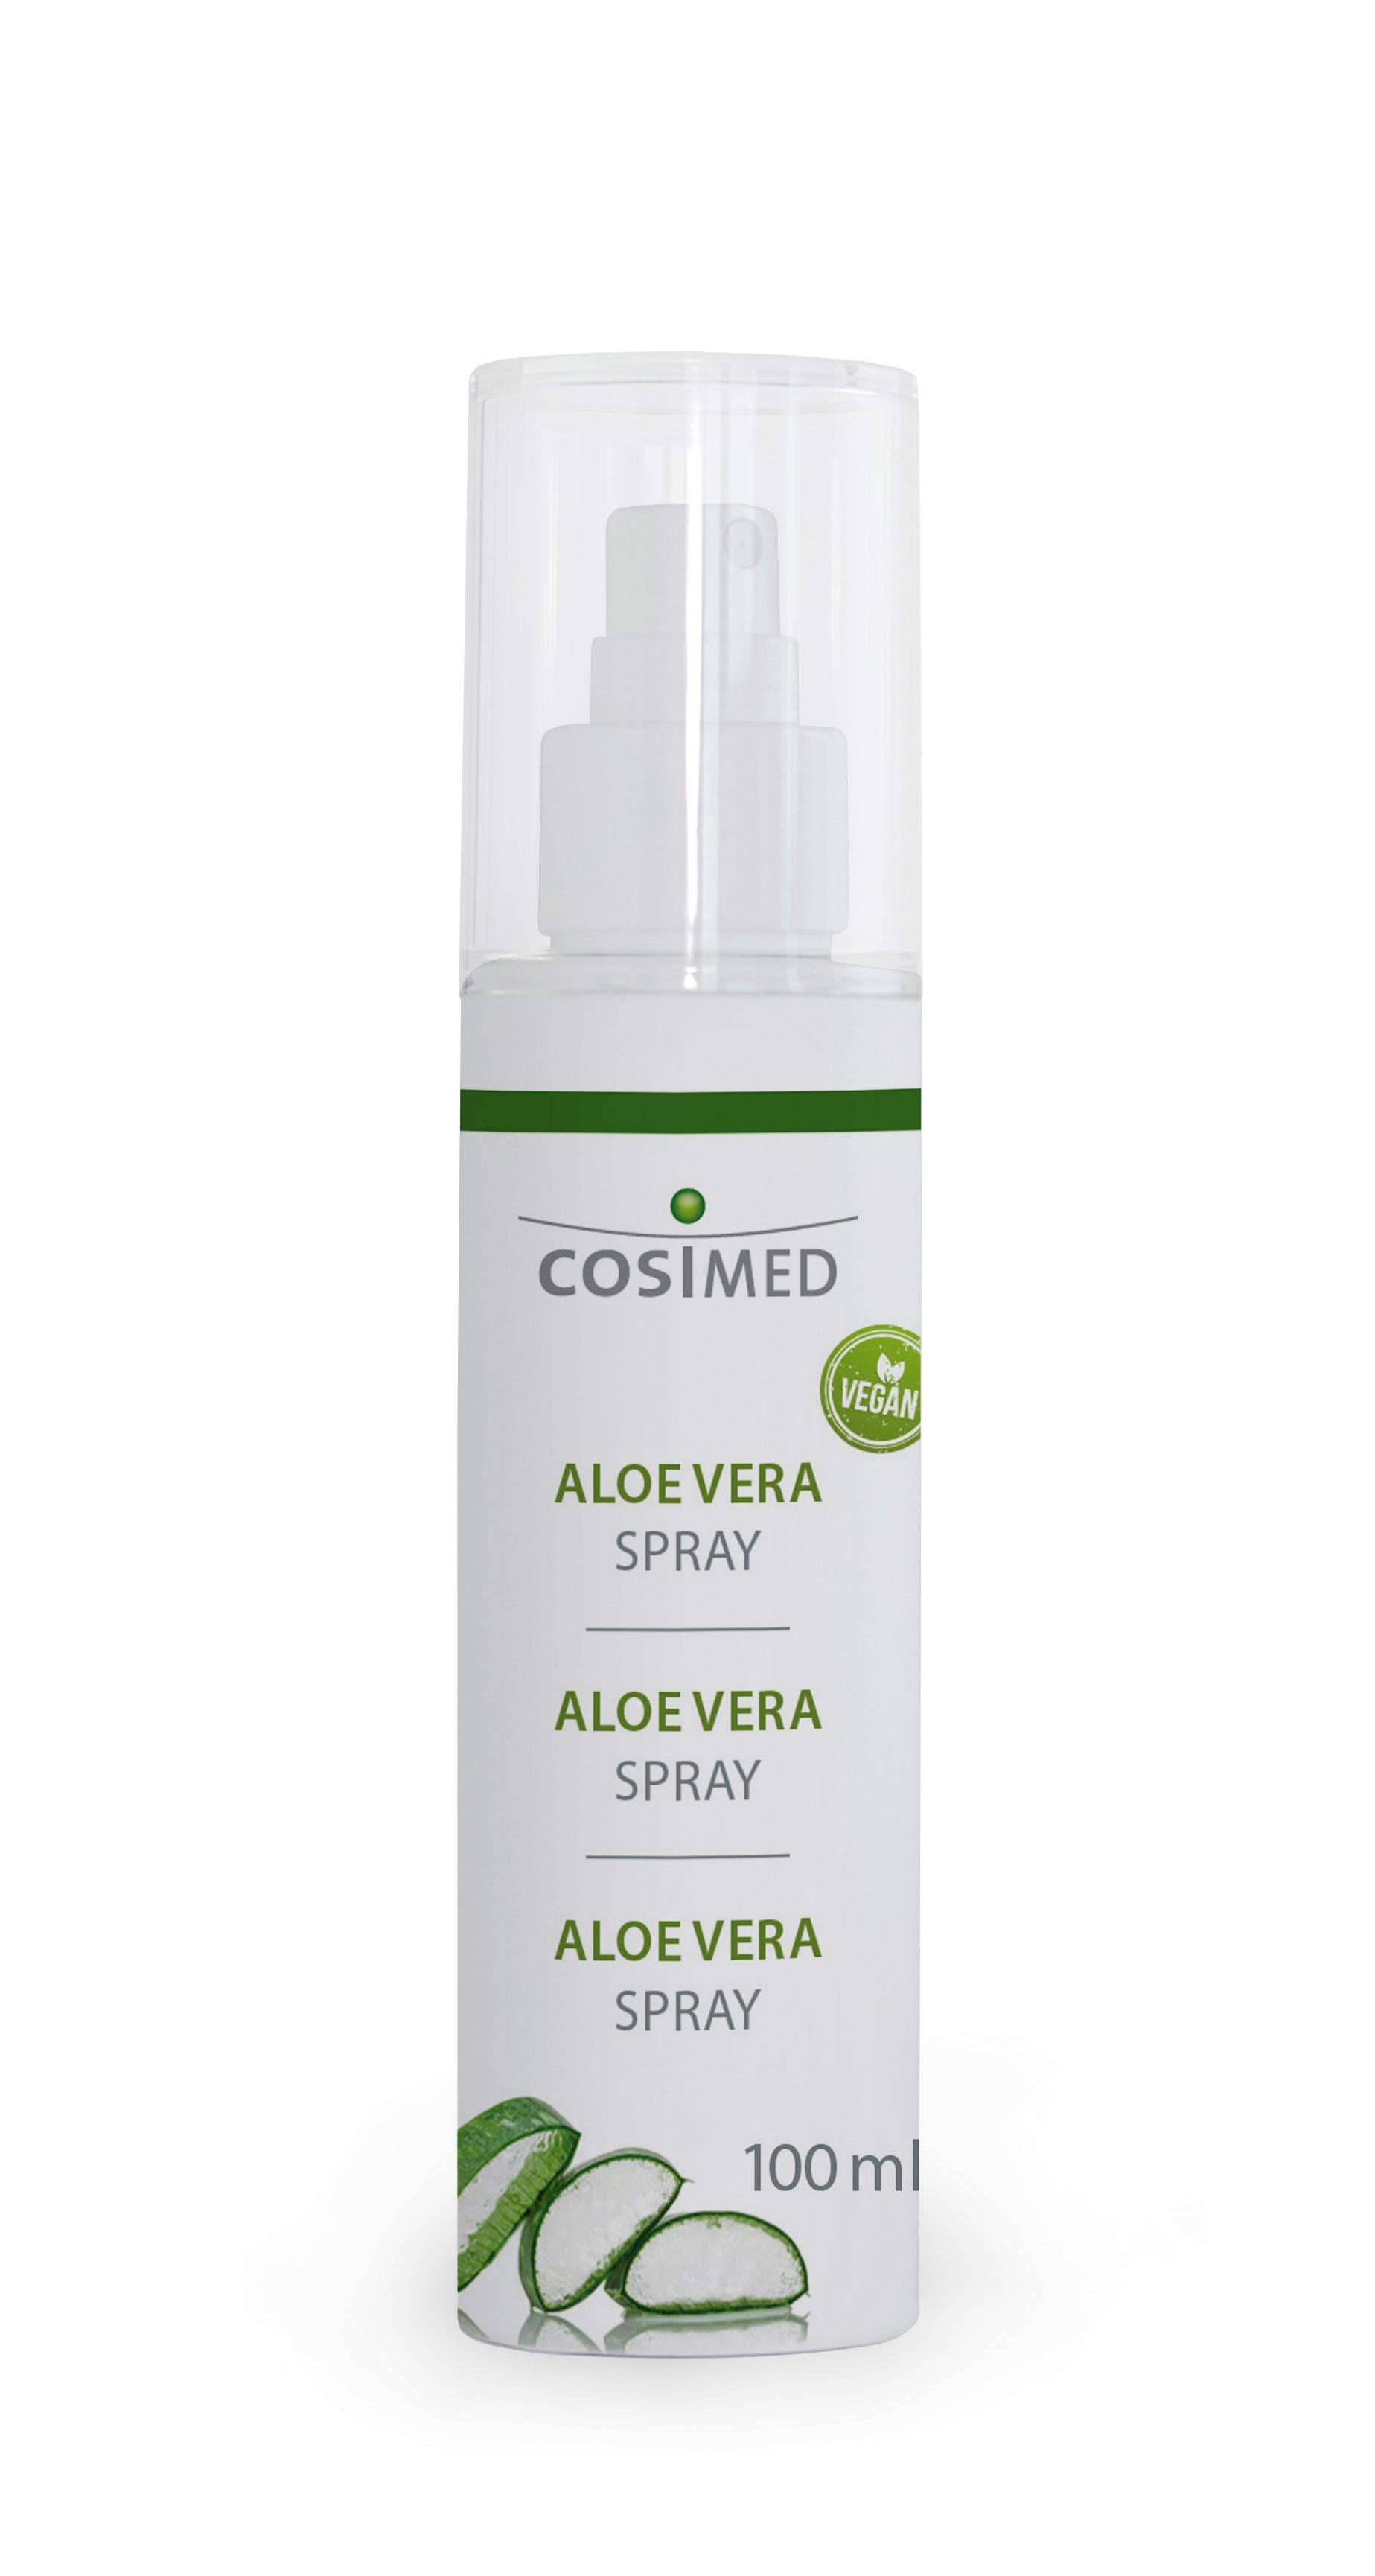 cosiMed Aloe Vera Spray Flasche 100 ml